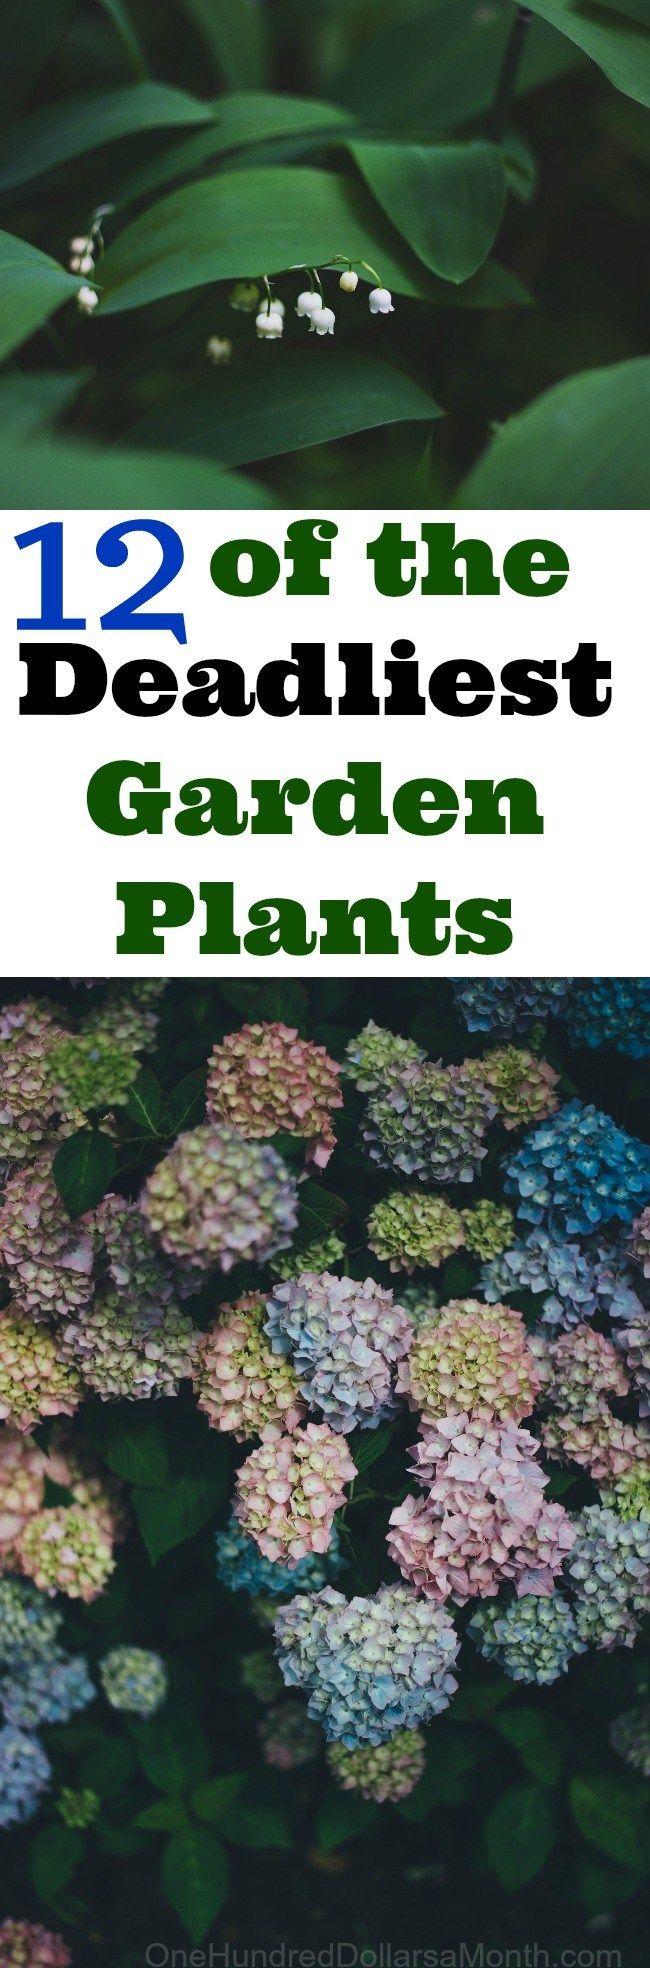 12 of the Deadliest Garden Plants, Garden Tips, Gardening Tips, Deadly Plants